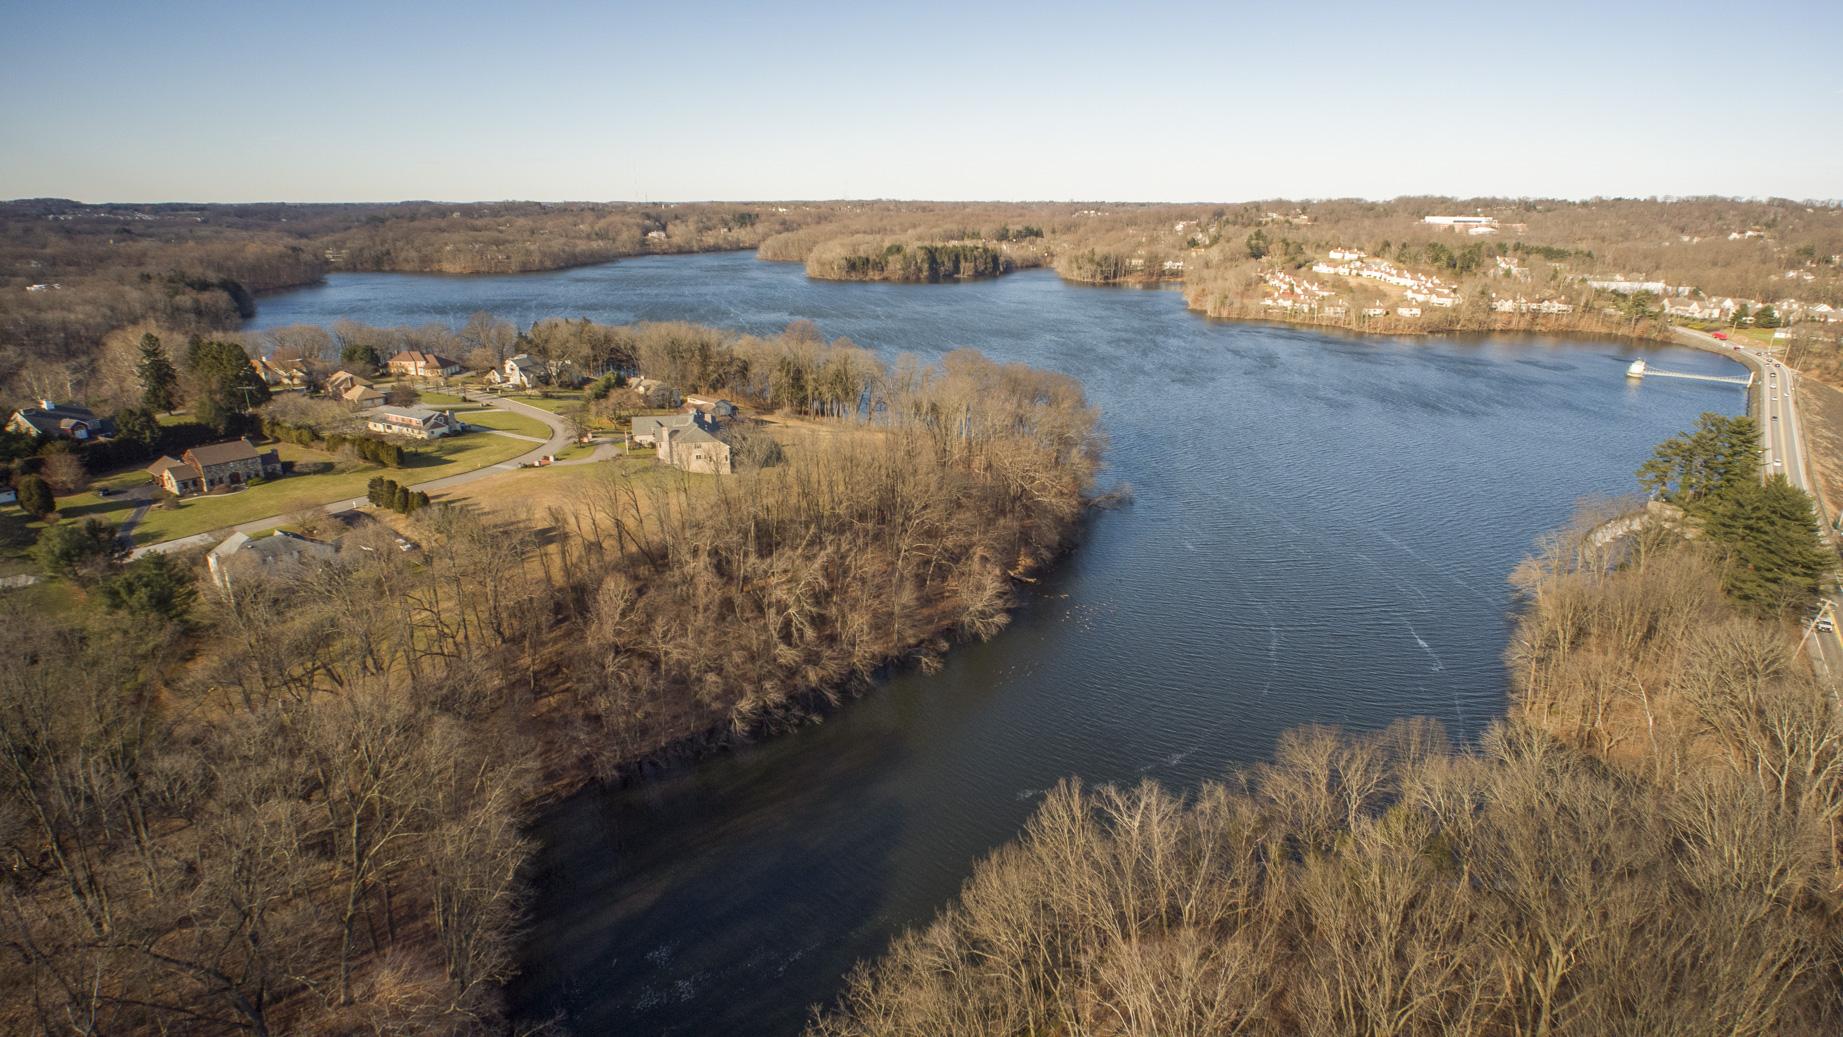 183 Palmers Mill Rd (Drone)13.jpg